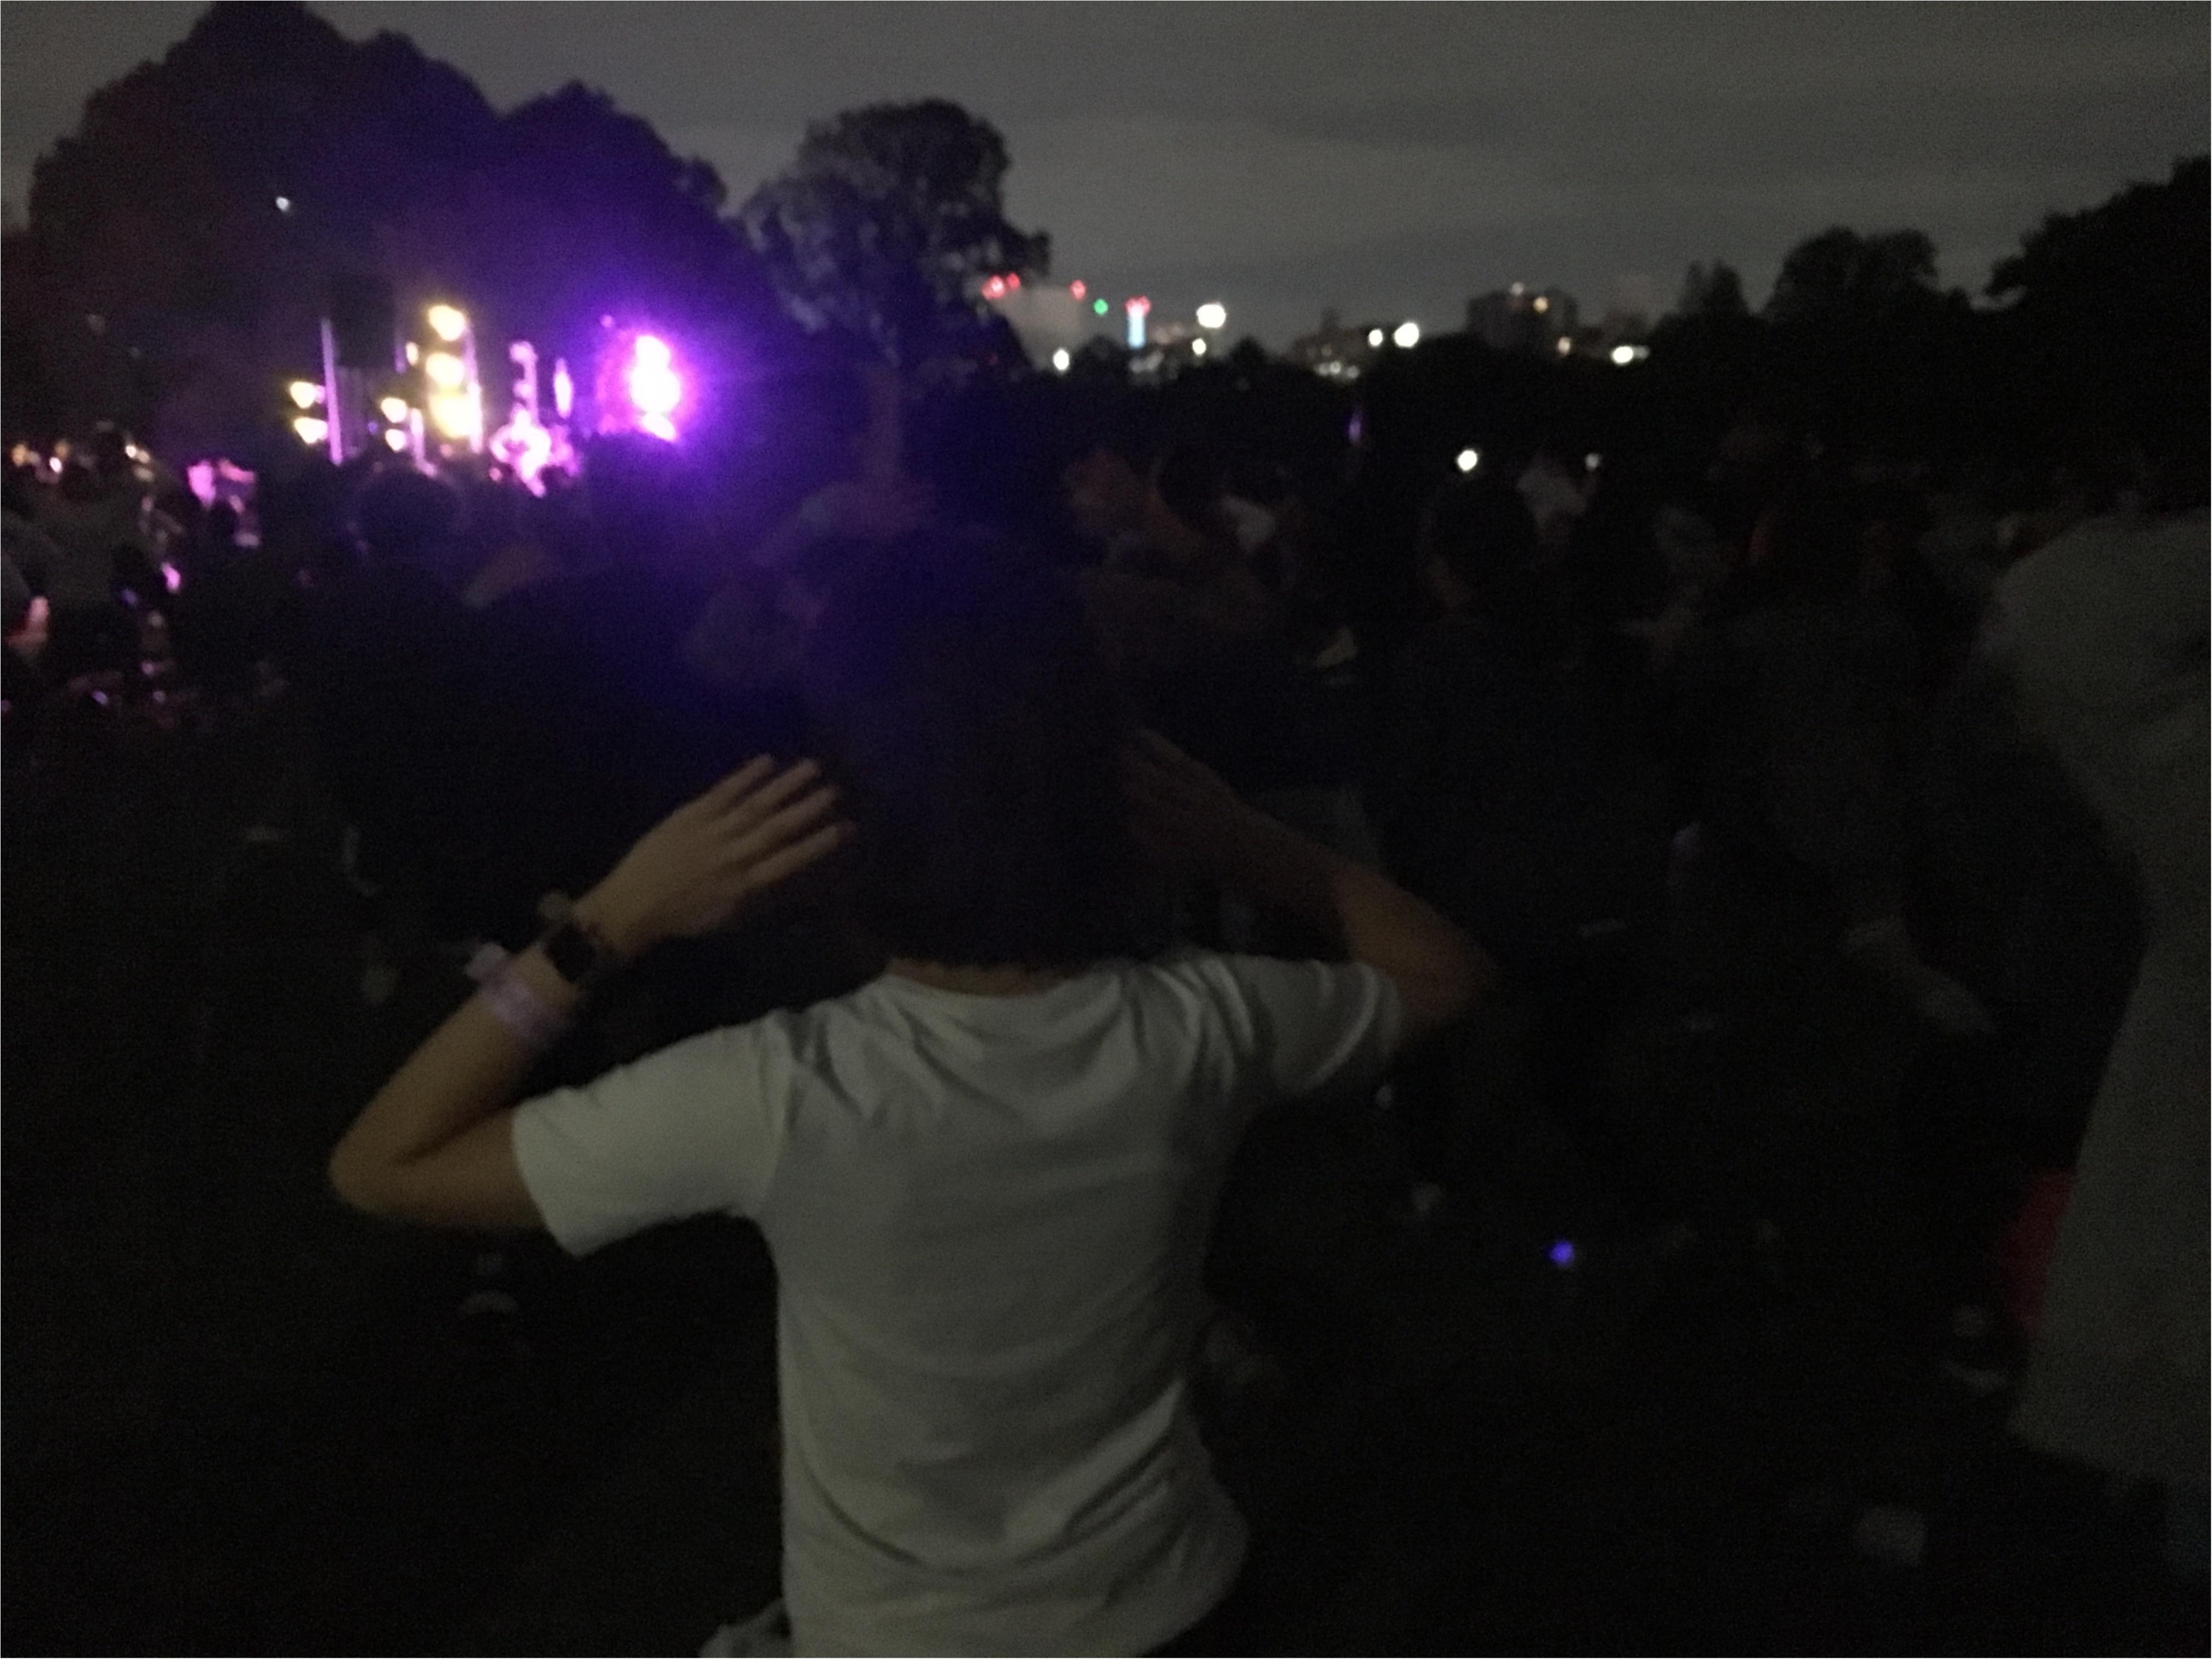 【NIKE(ナイキ)】『AFTER DARK』夜の新宿御苑でラン&トレーニング!_2